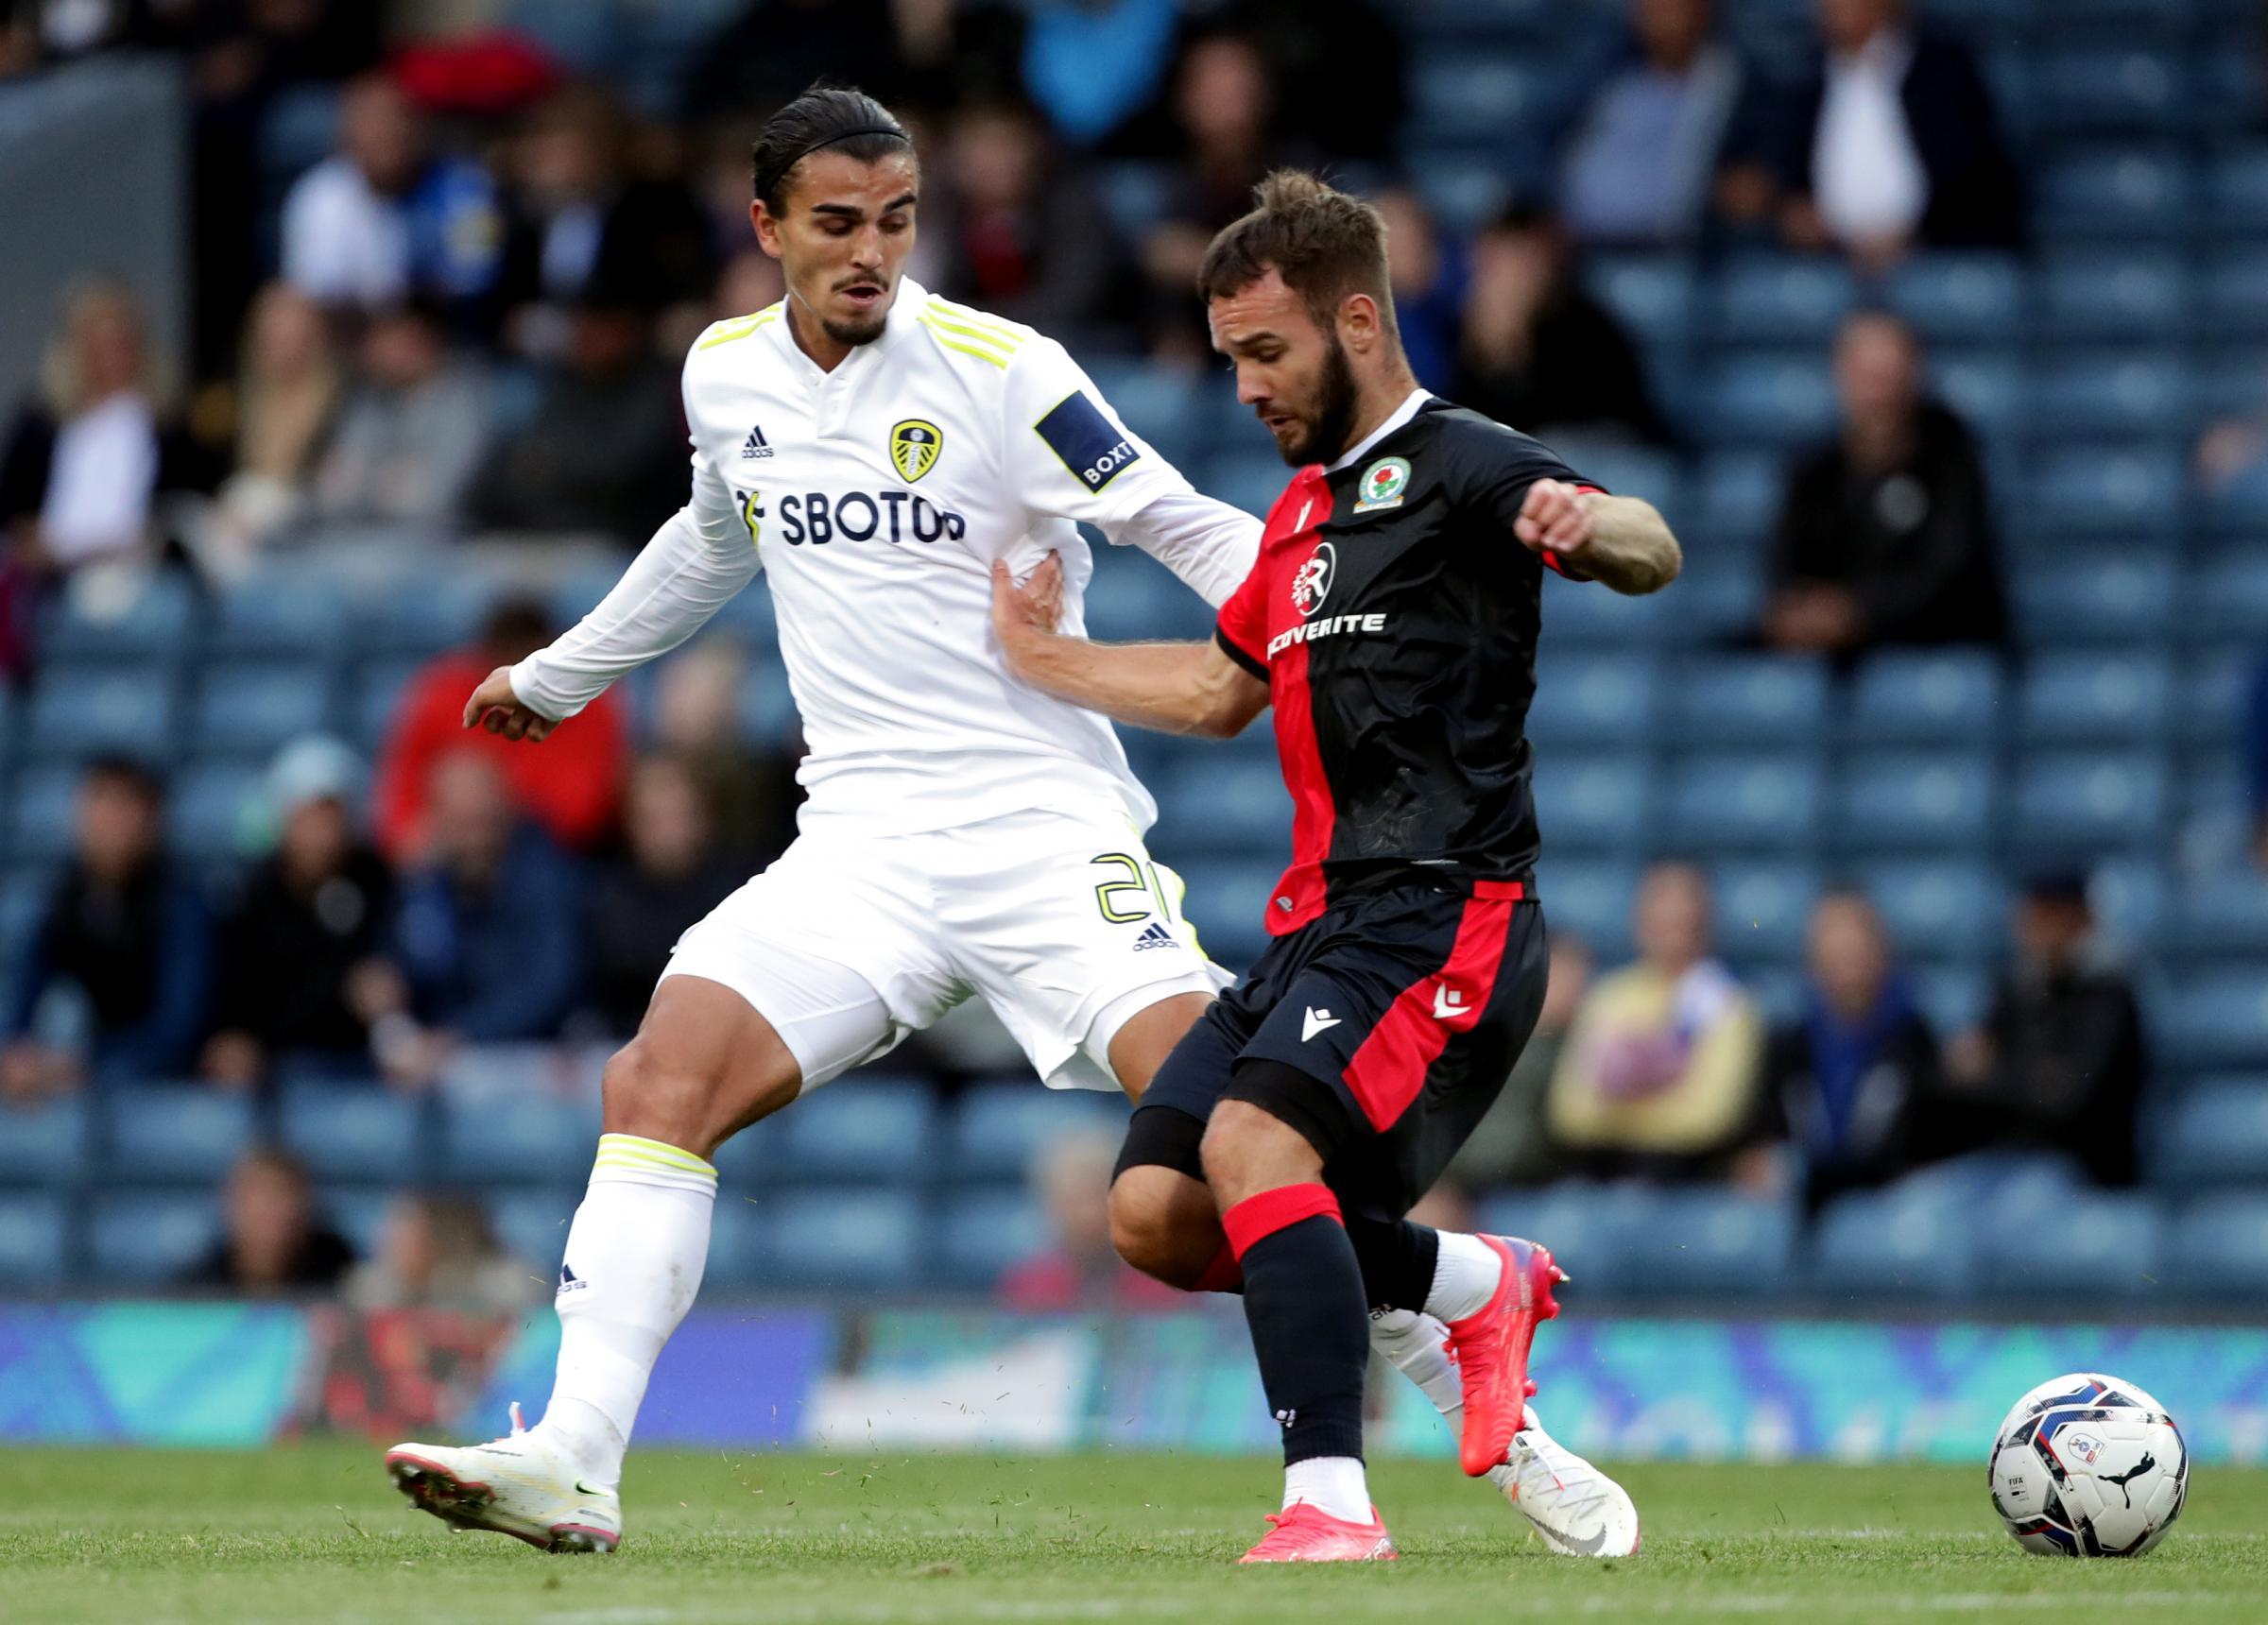 Blackburn's Tony Mowbray backs Saints' Adam Armstrong deal